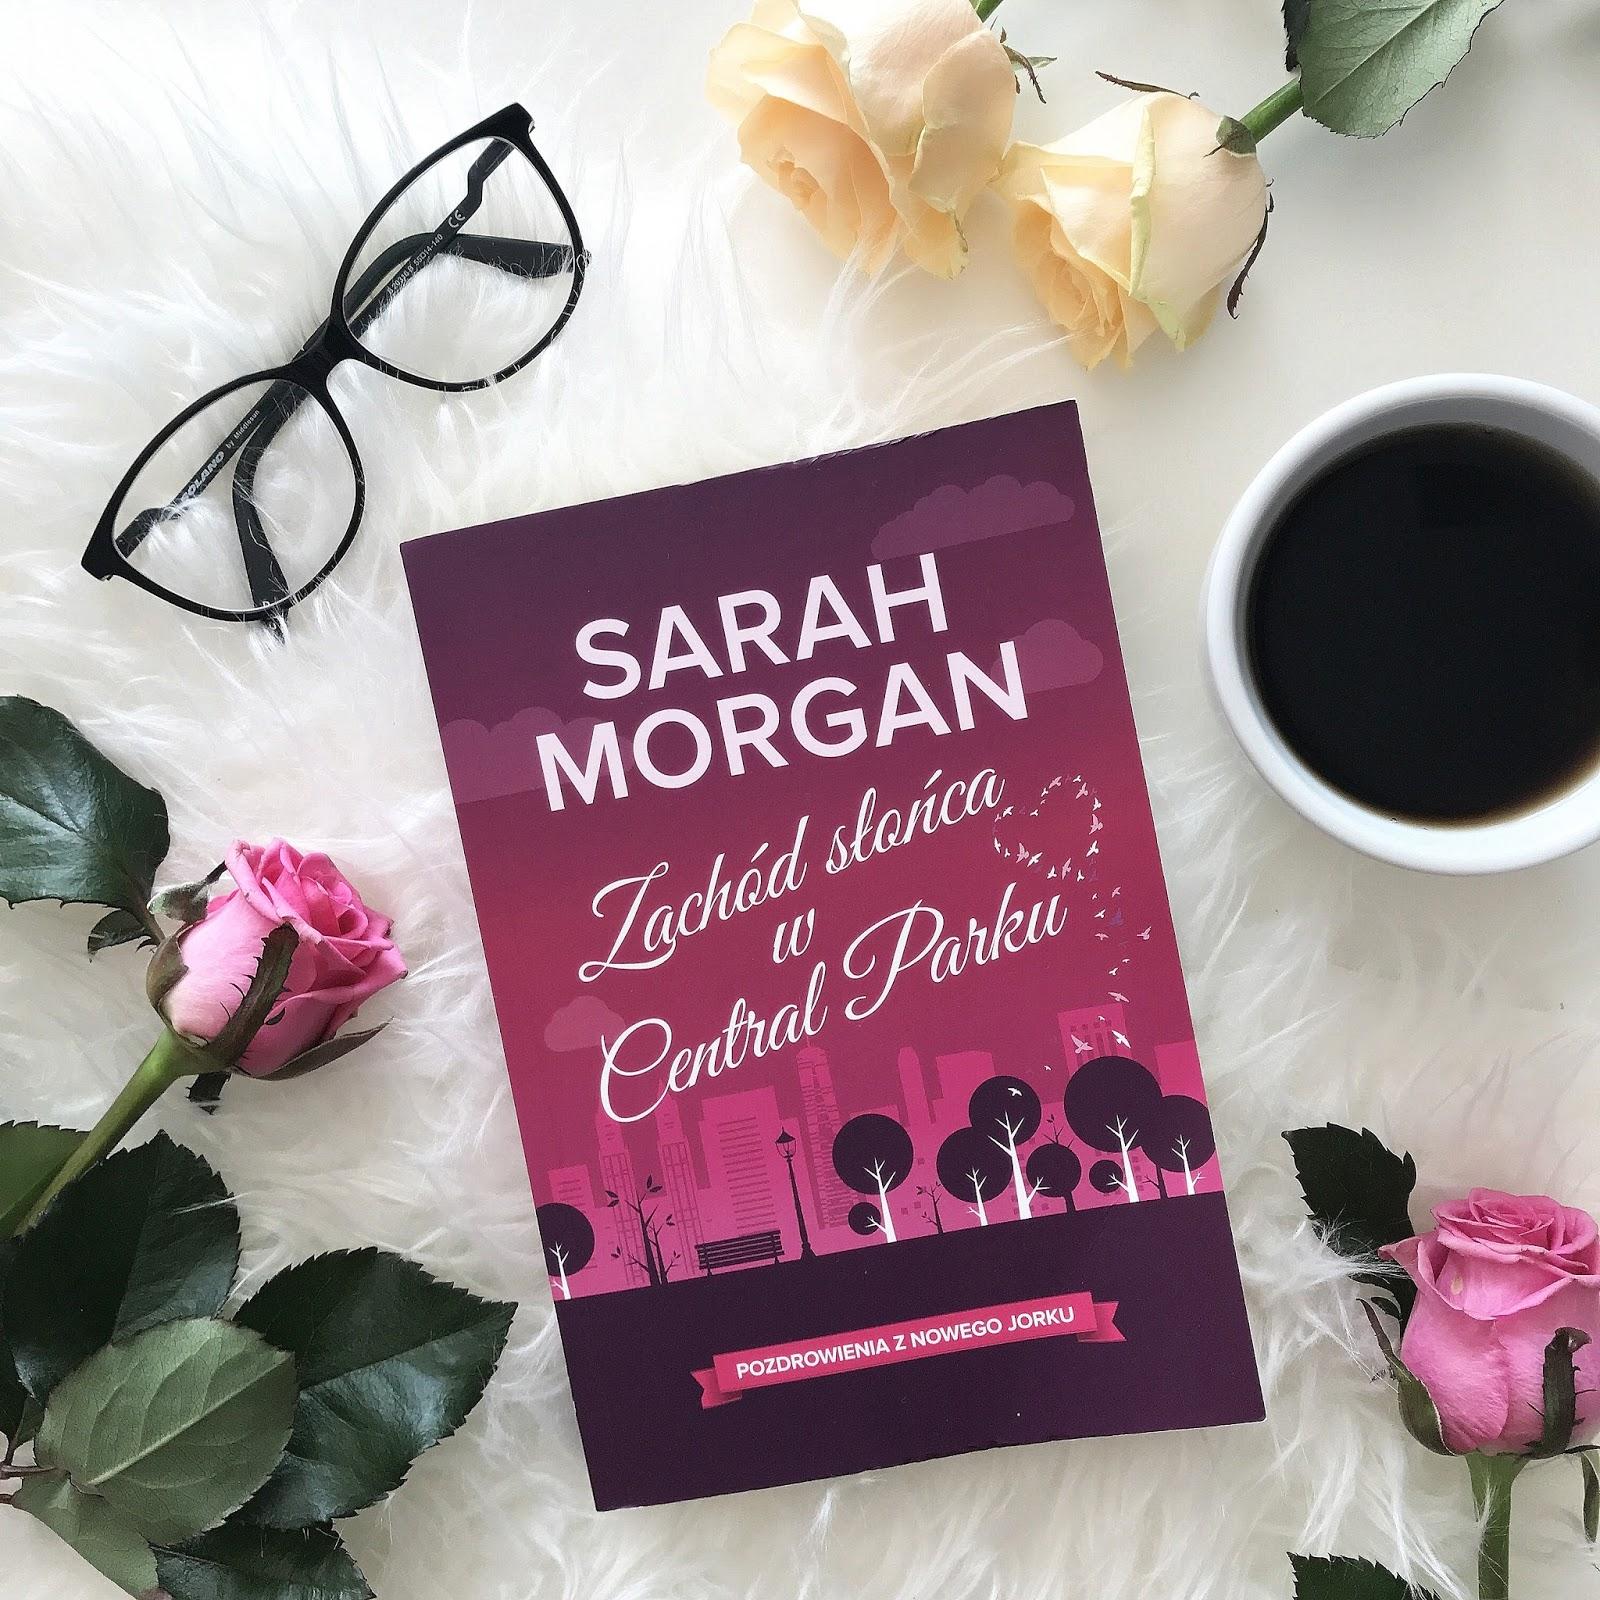 Sarah Morgan, Zachód słońca w Central Parku